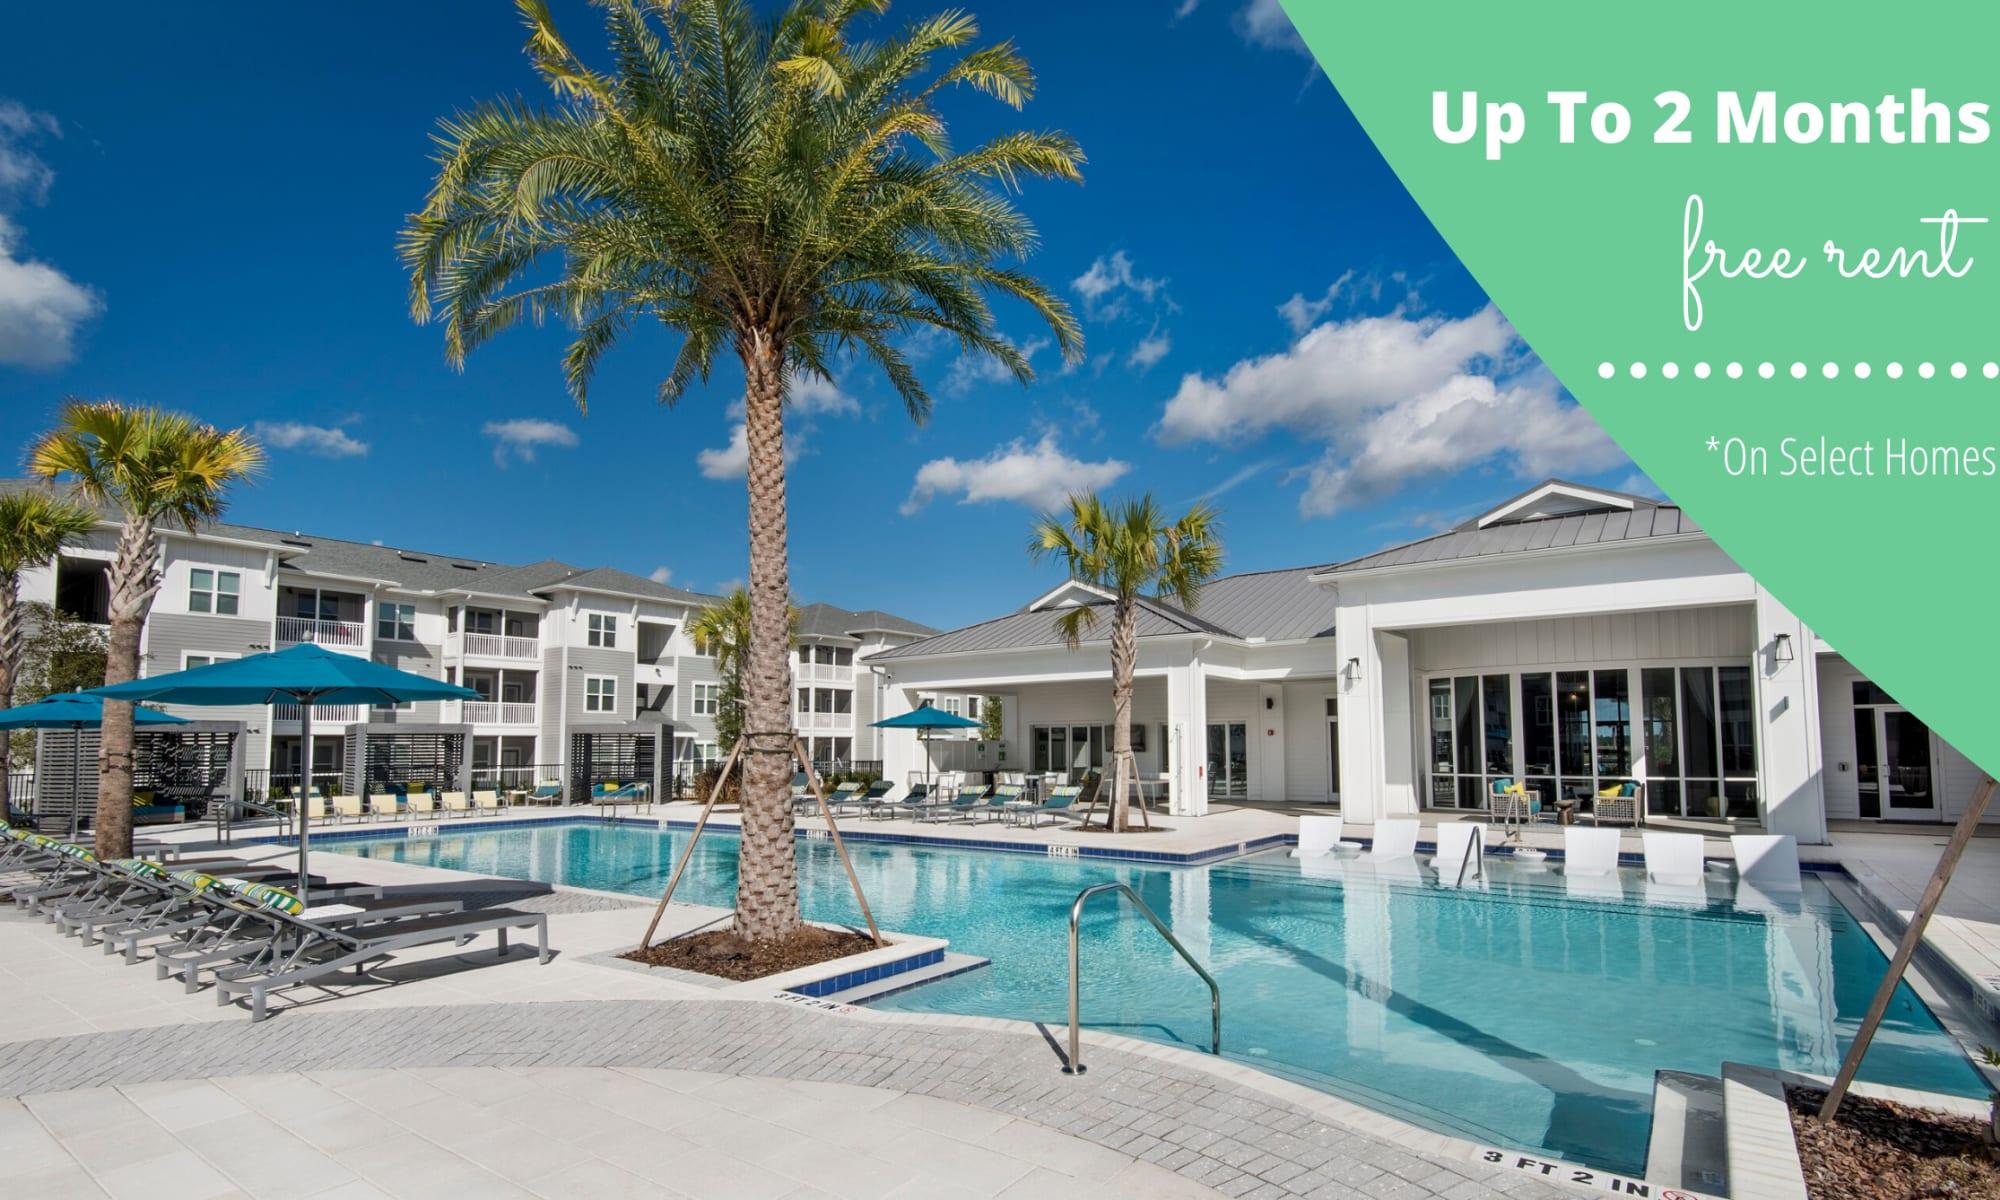 Apartments at The Elysian in St Johns, Florida